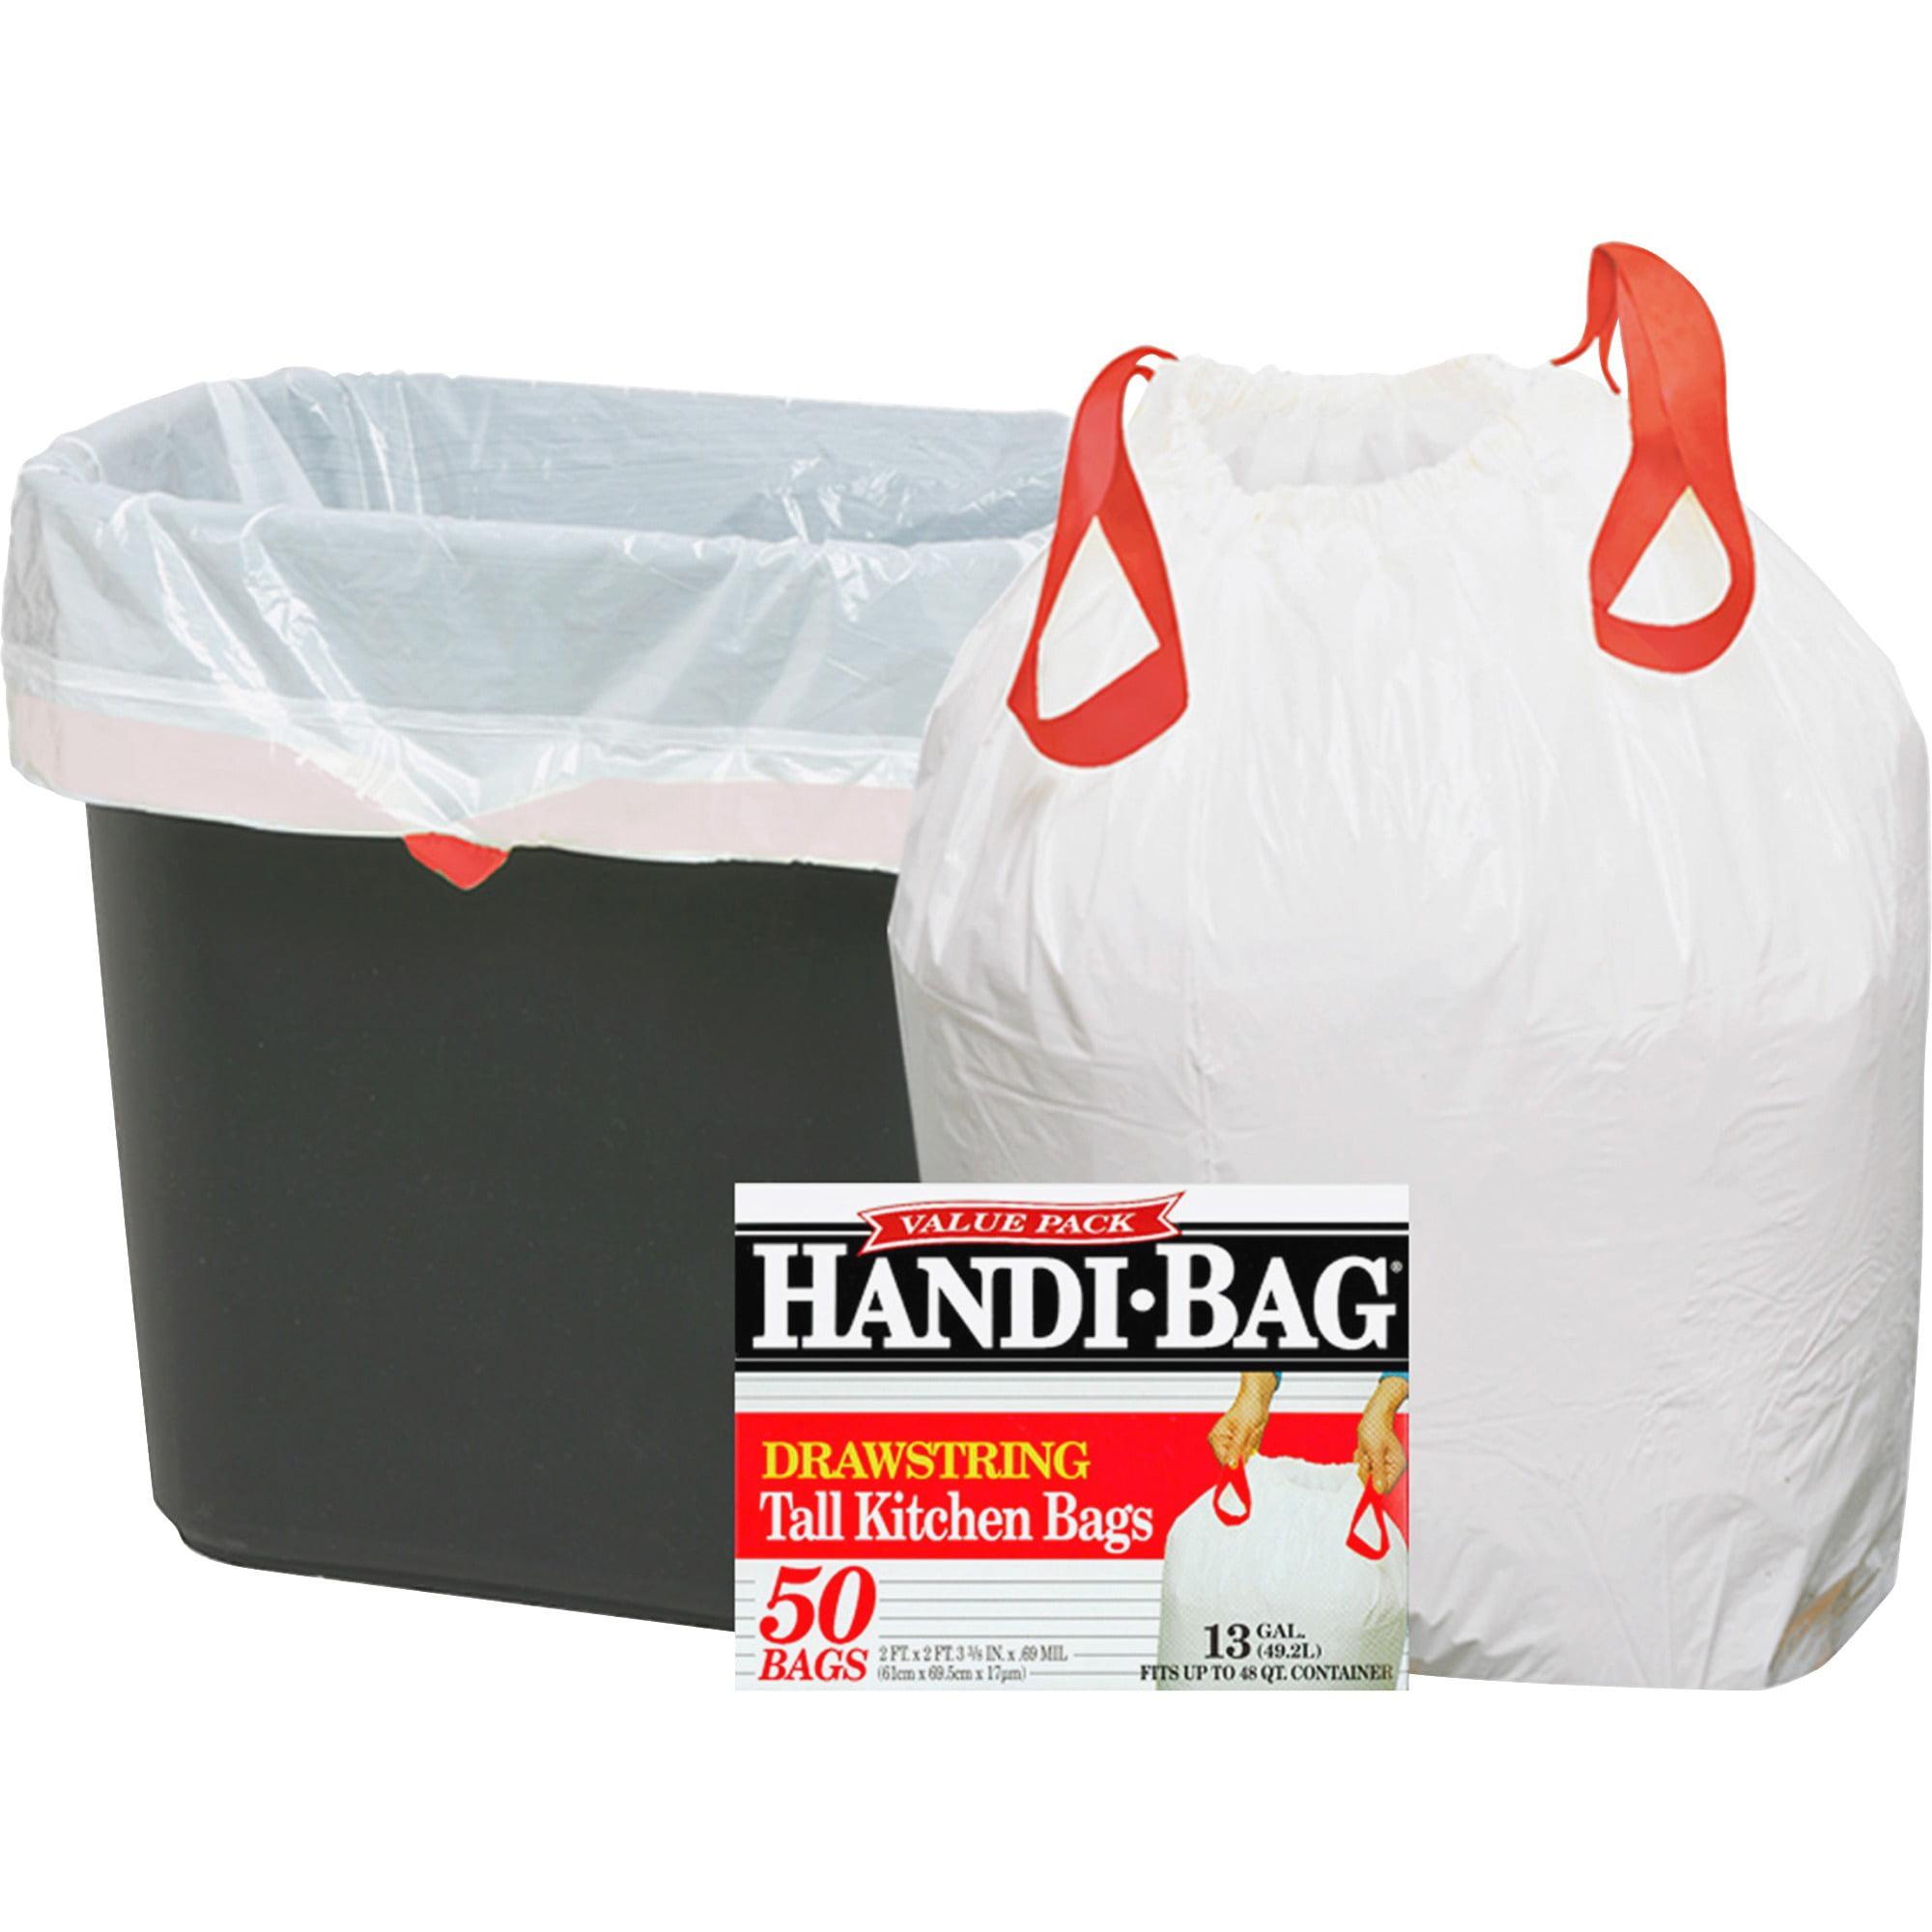 Webster Handi-Bag Tall Kitchen Drawstring Bags, 13 Gallon, 50 Count